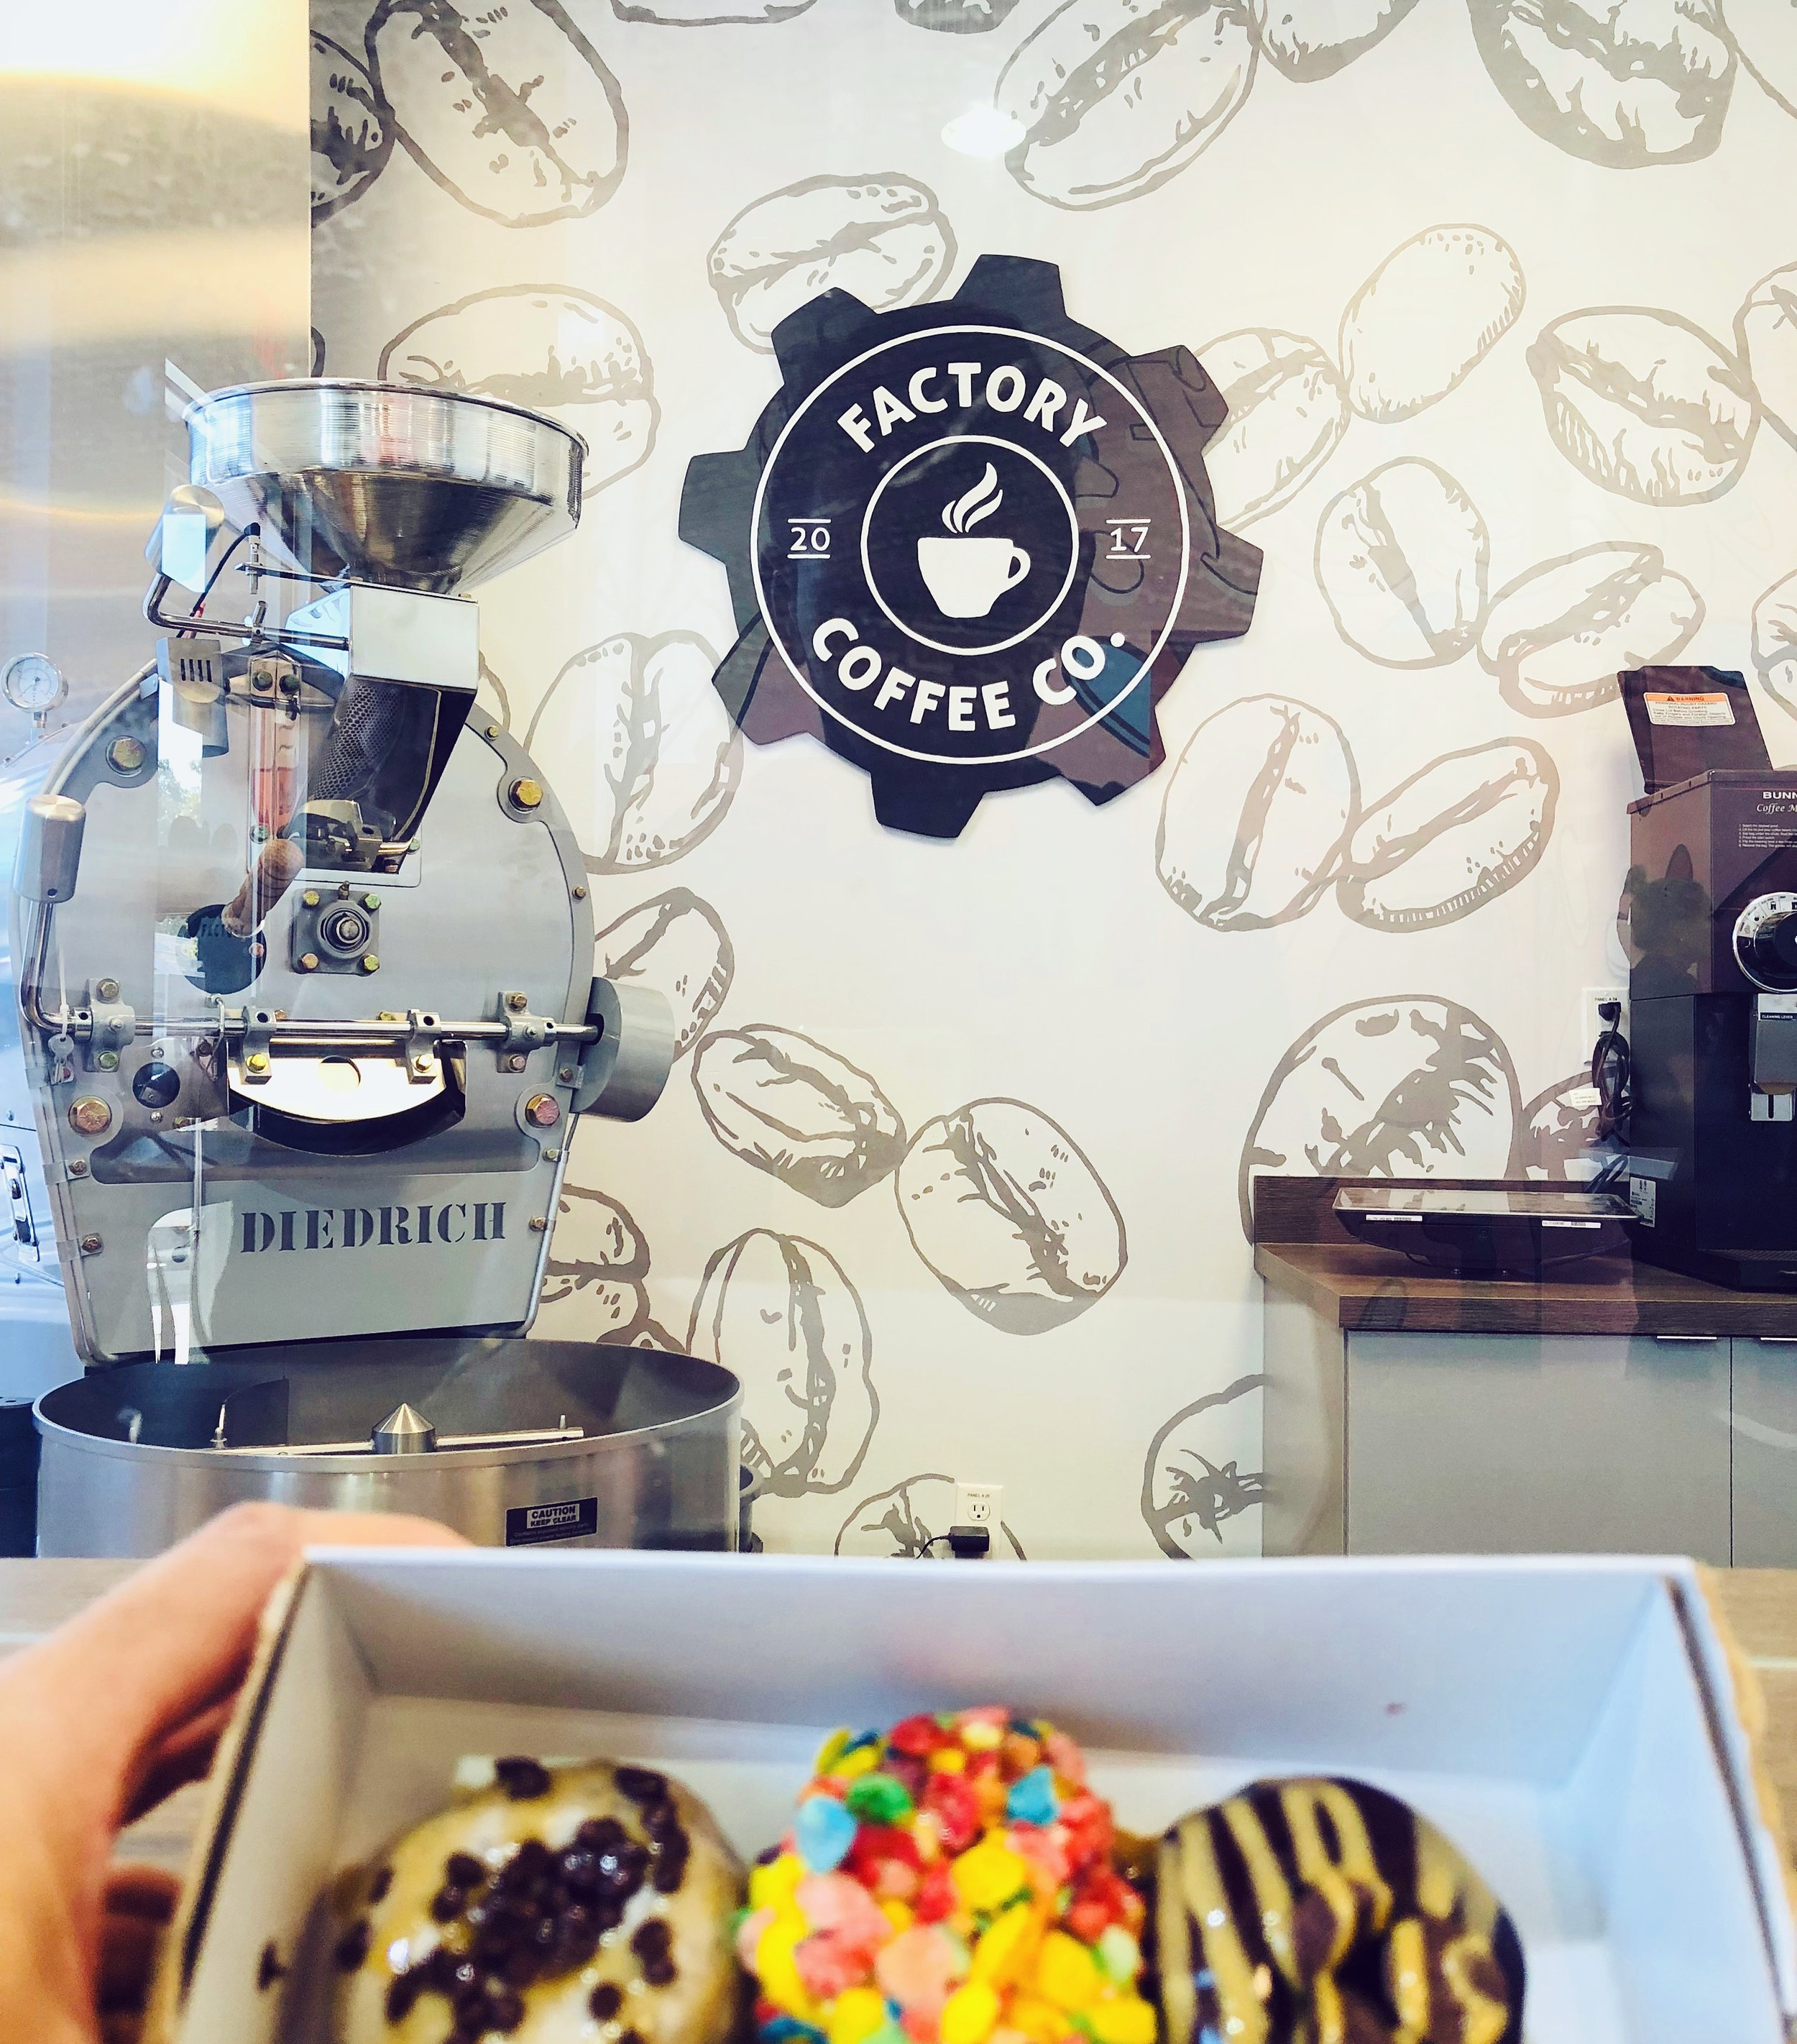 Leo-gomez-studio-hand-painted-sign-mini-doughnut-04.jpg